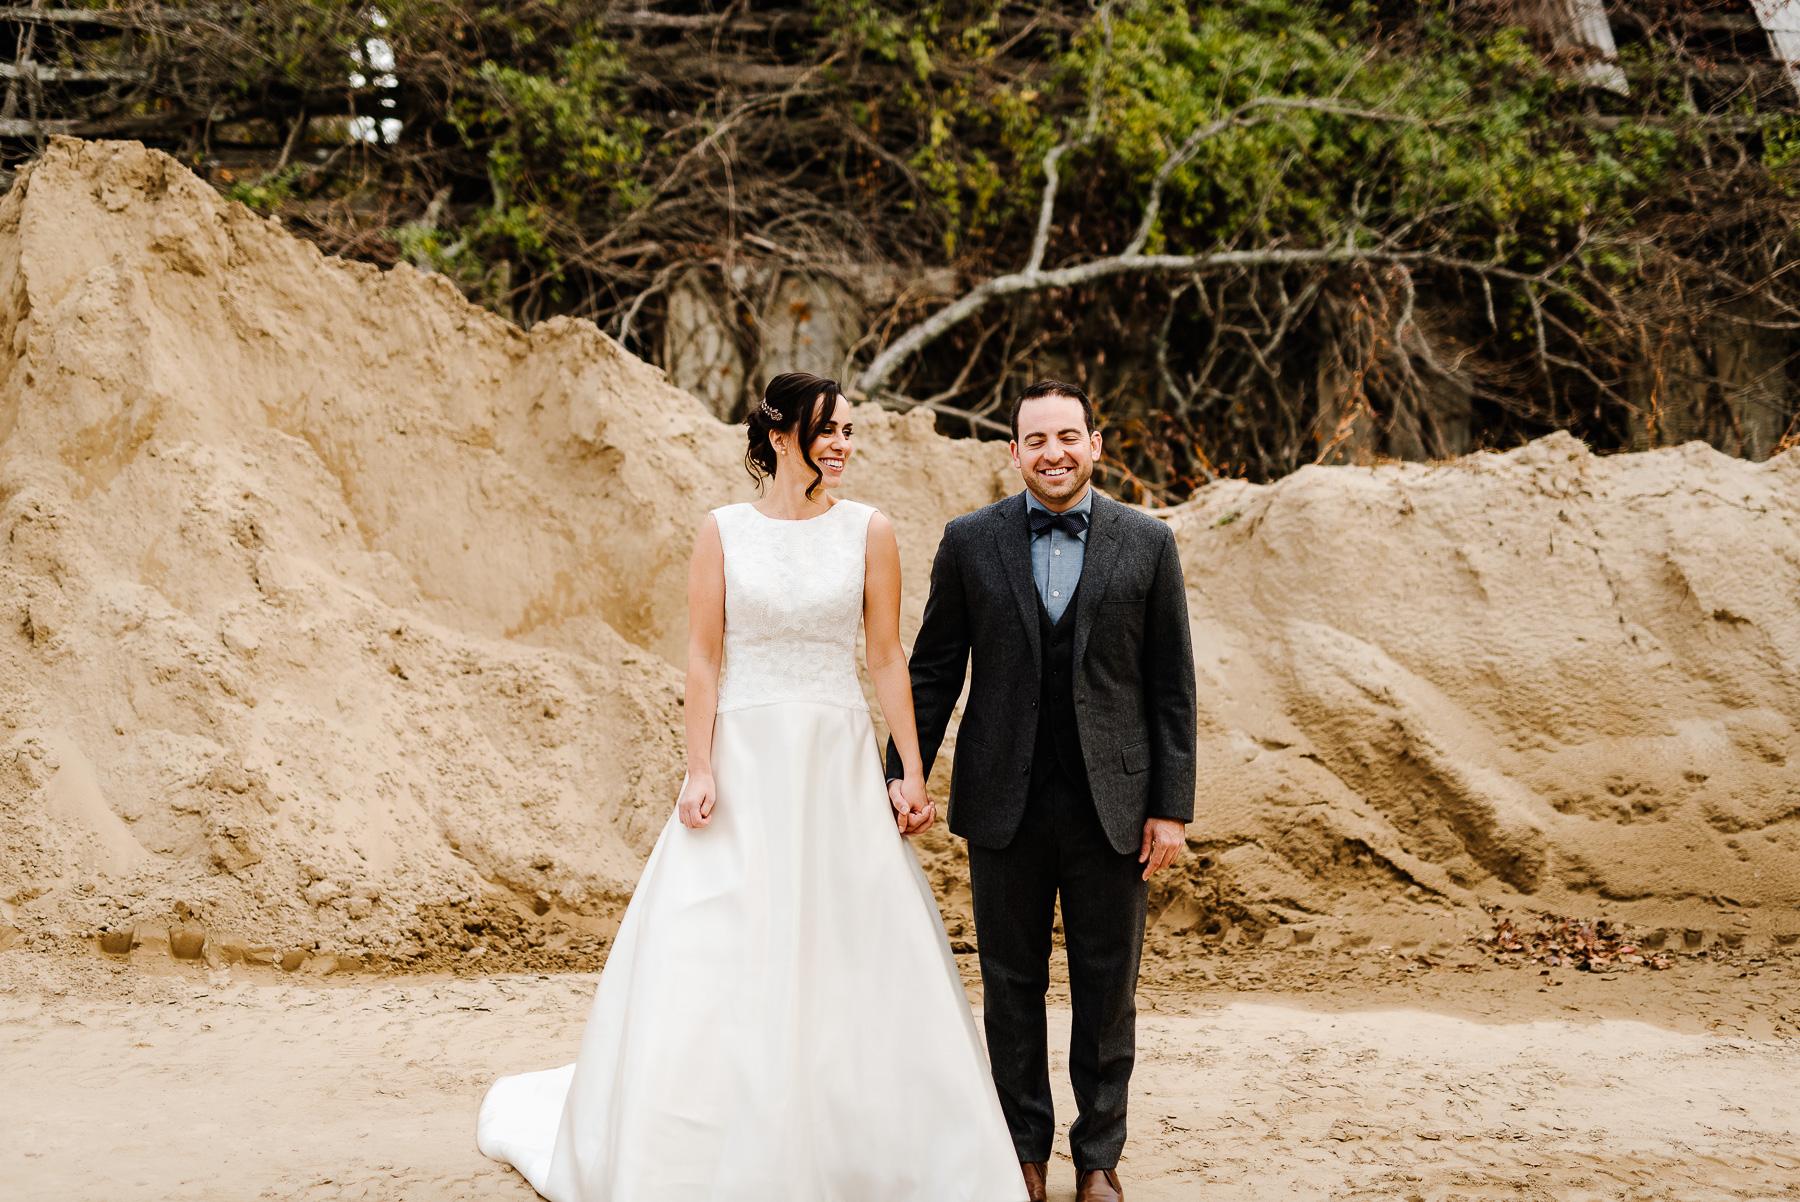 35-Laurita Winery Wedding New Jersey Wedding Photographer Laurita Winery Weddings Longbrook Photography.jpg